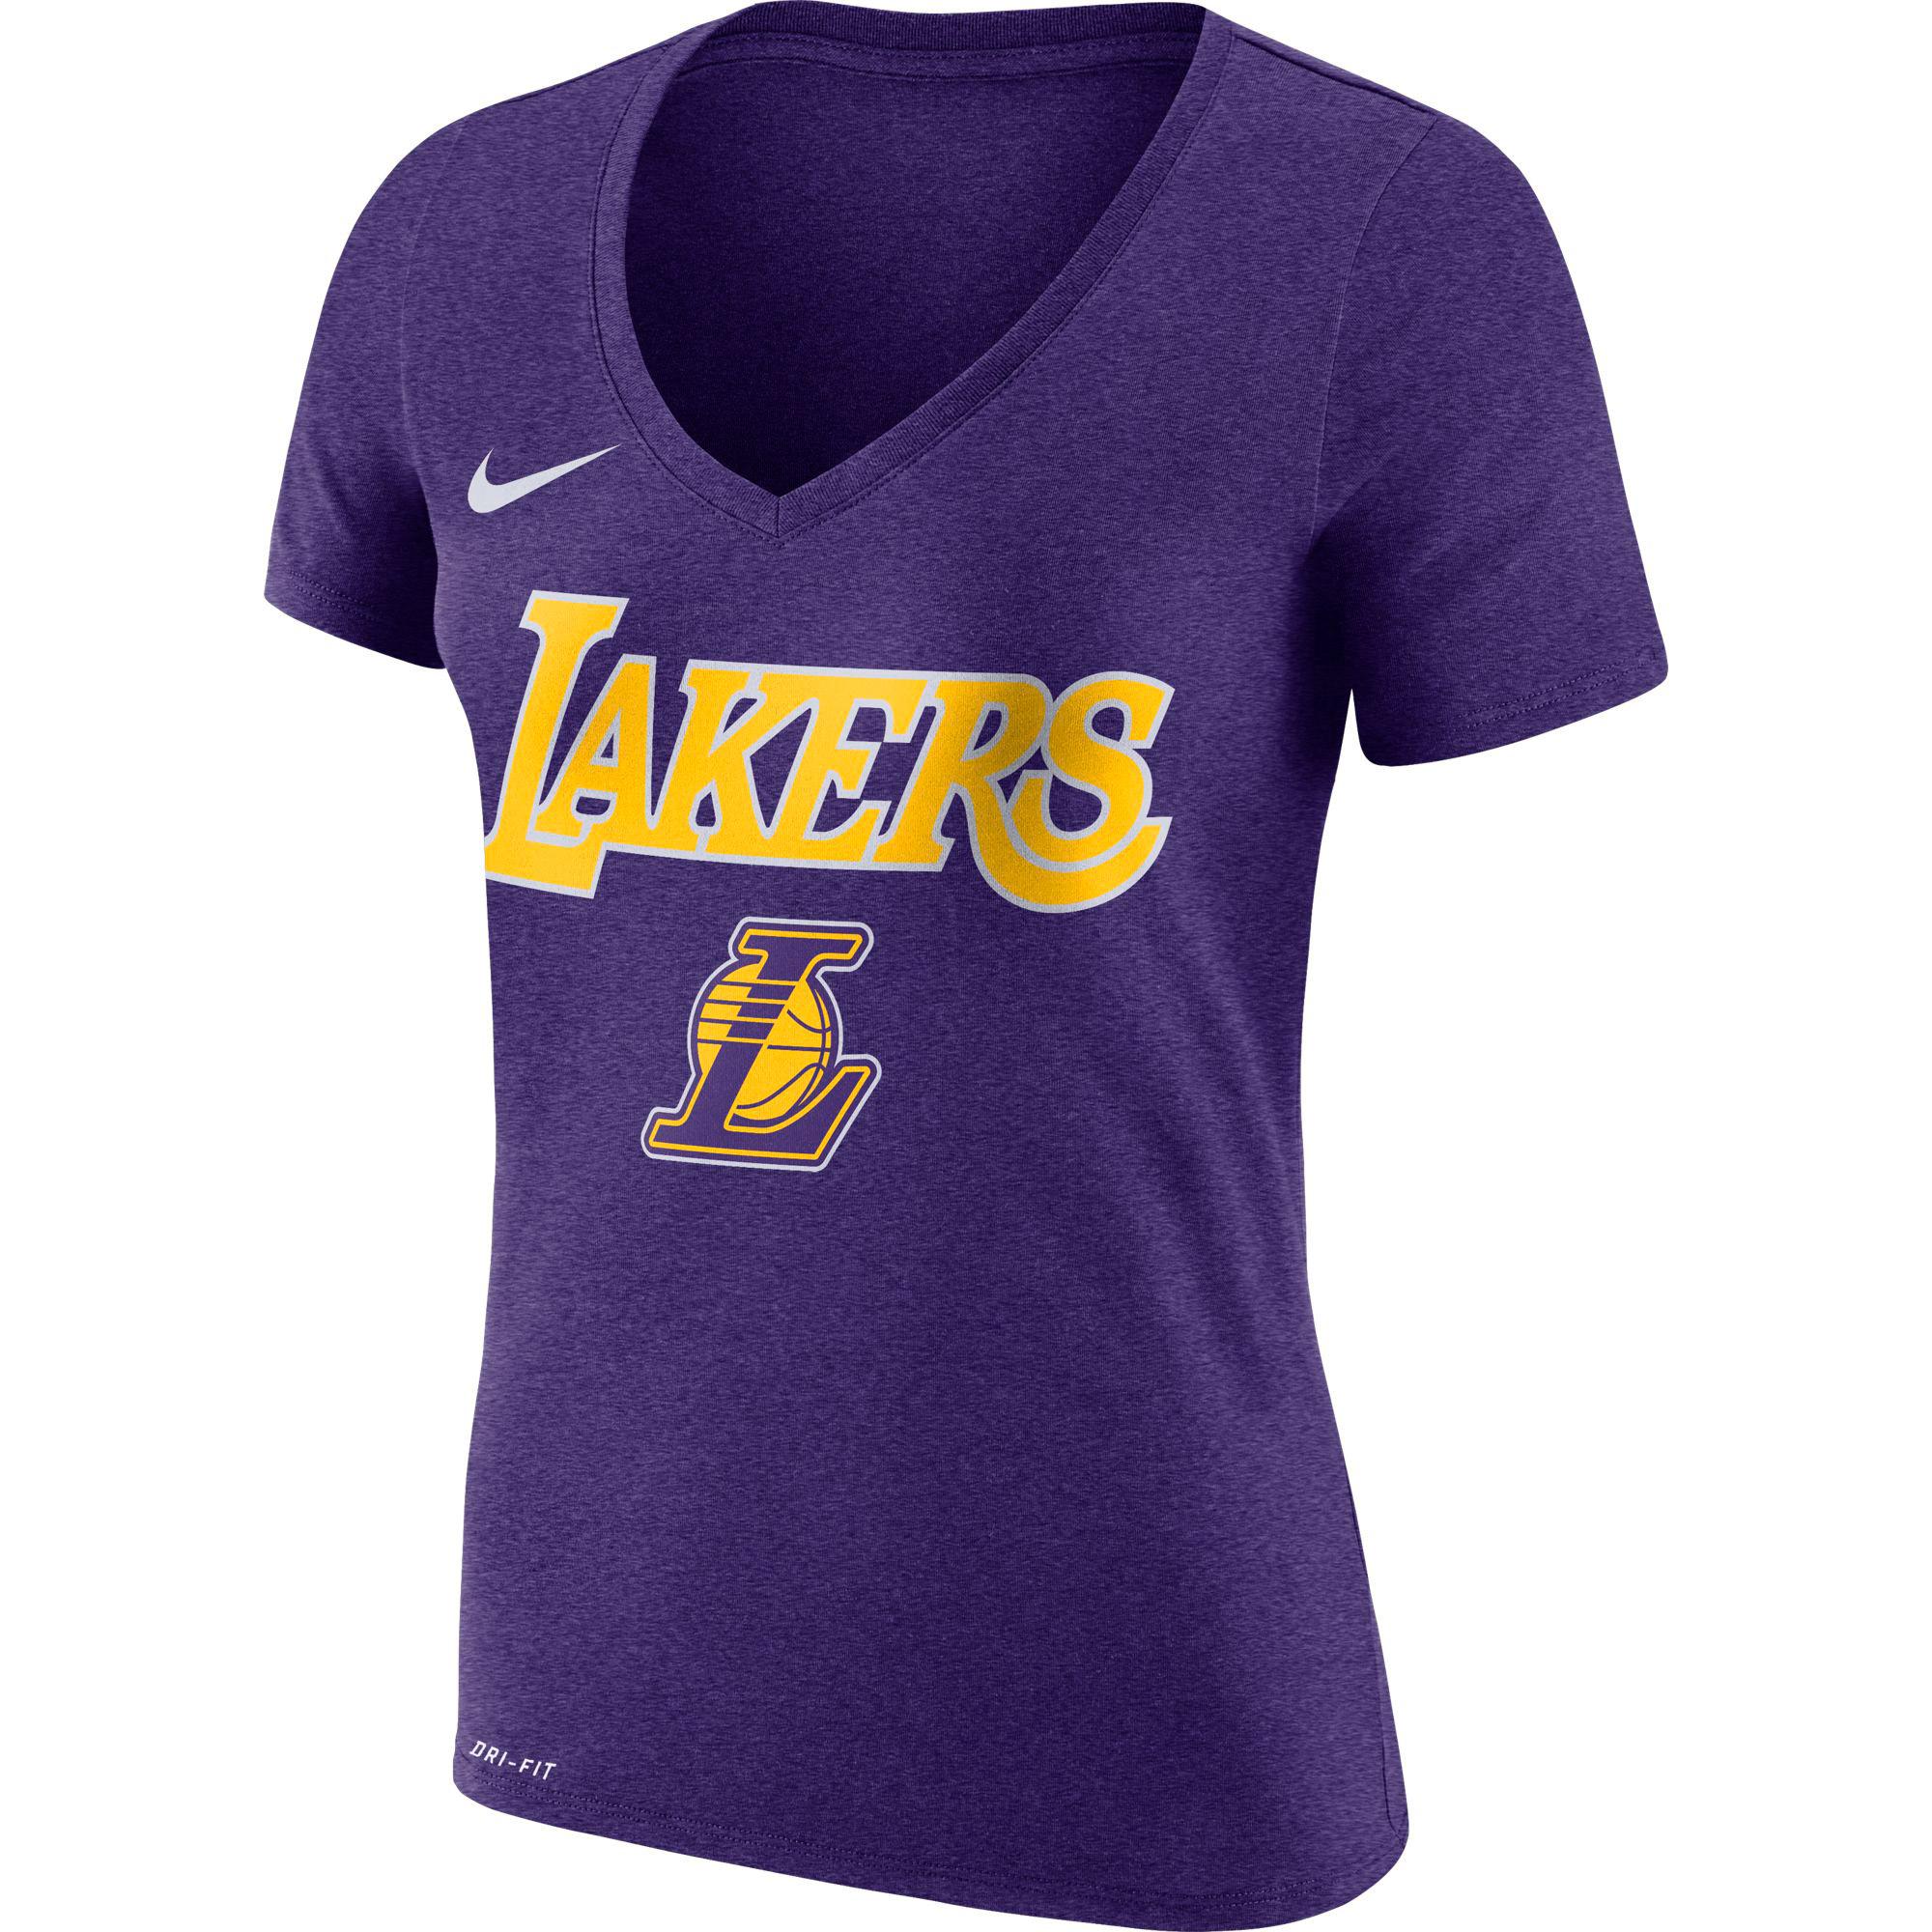 Los Angeles Lakers Nike Women's Wordmark V-Neck T-Shirt - Purple